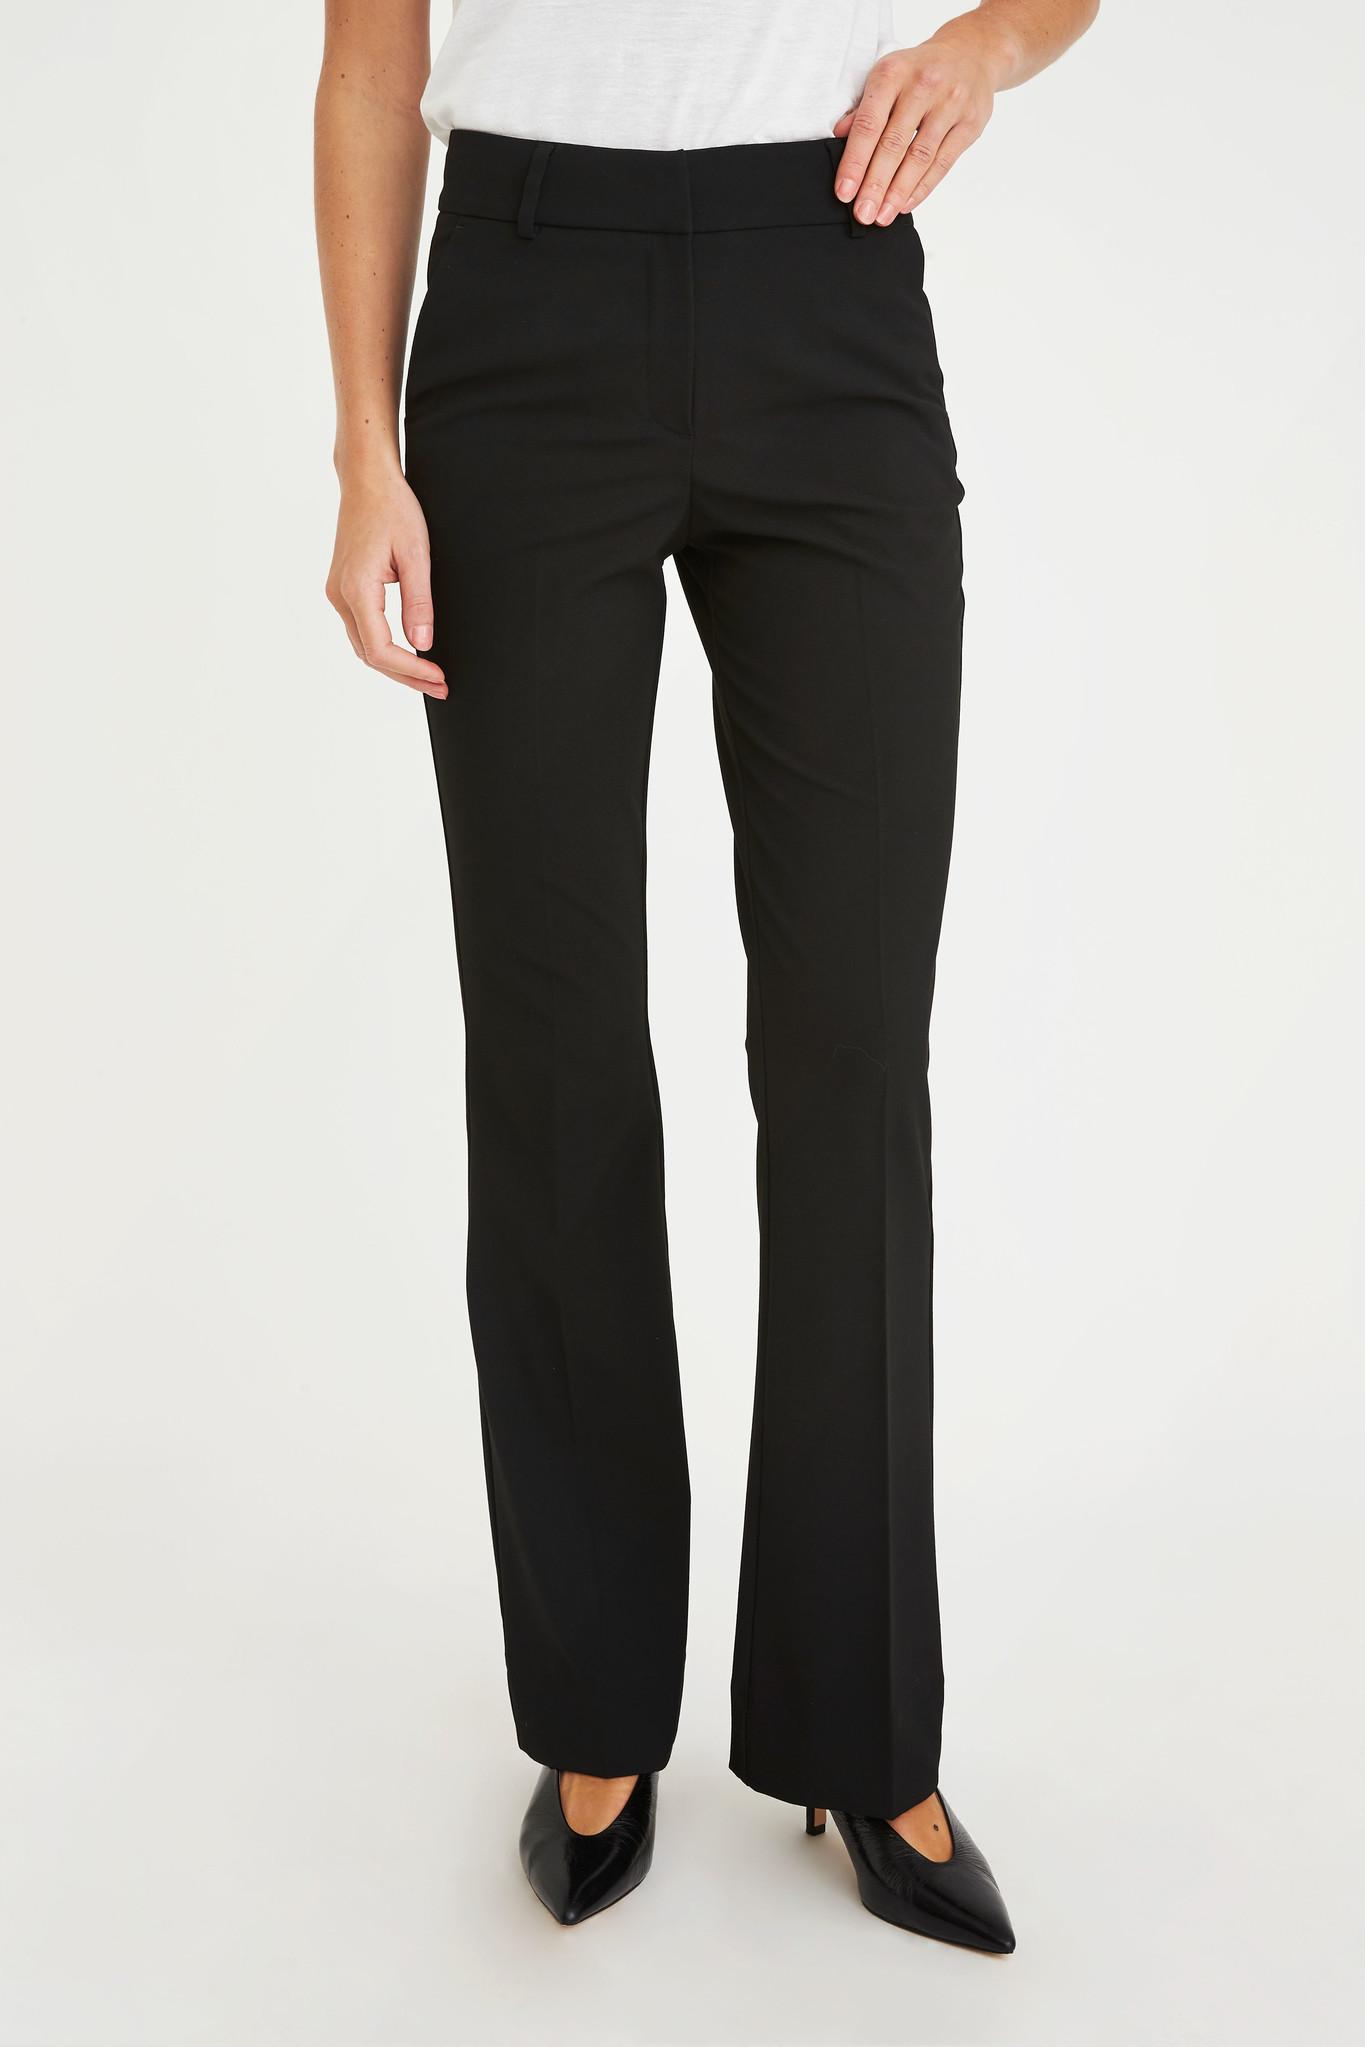 Clara 285 Long Pants - Black Glow-2